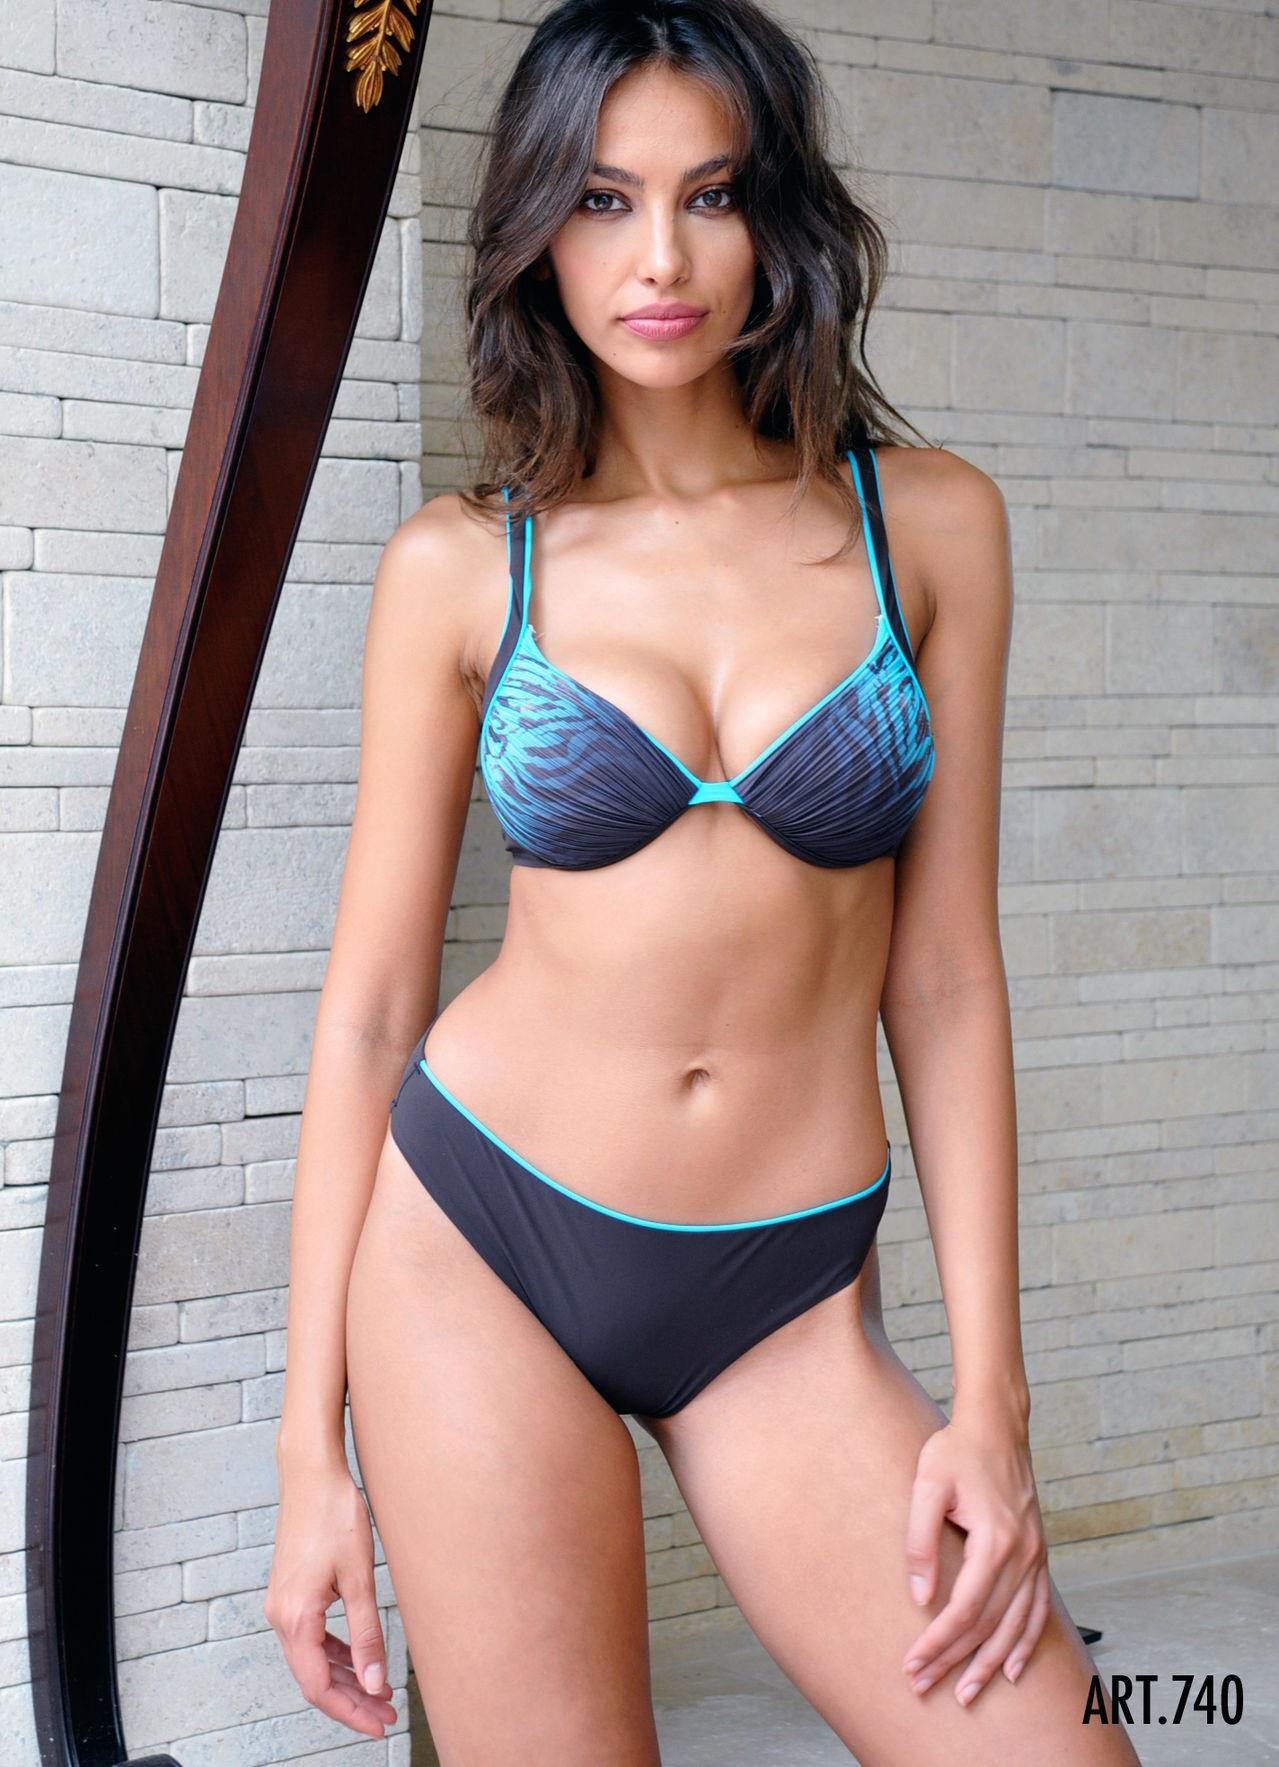 Bikini Madalina Diana Ghenea nude photos 2019